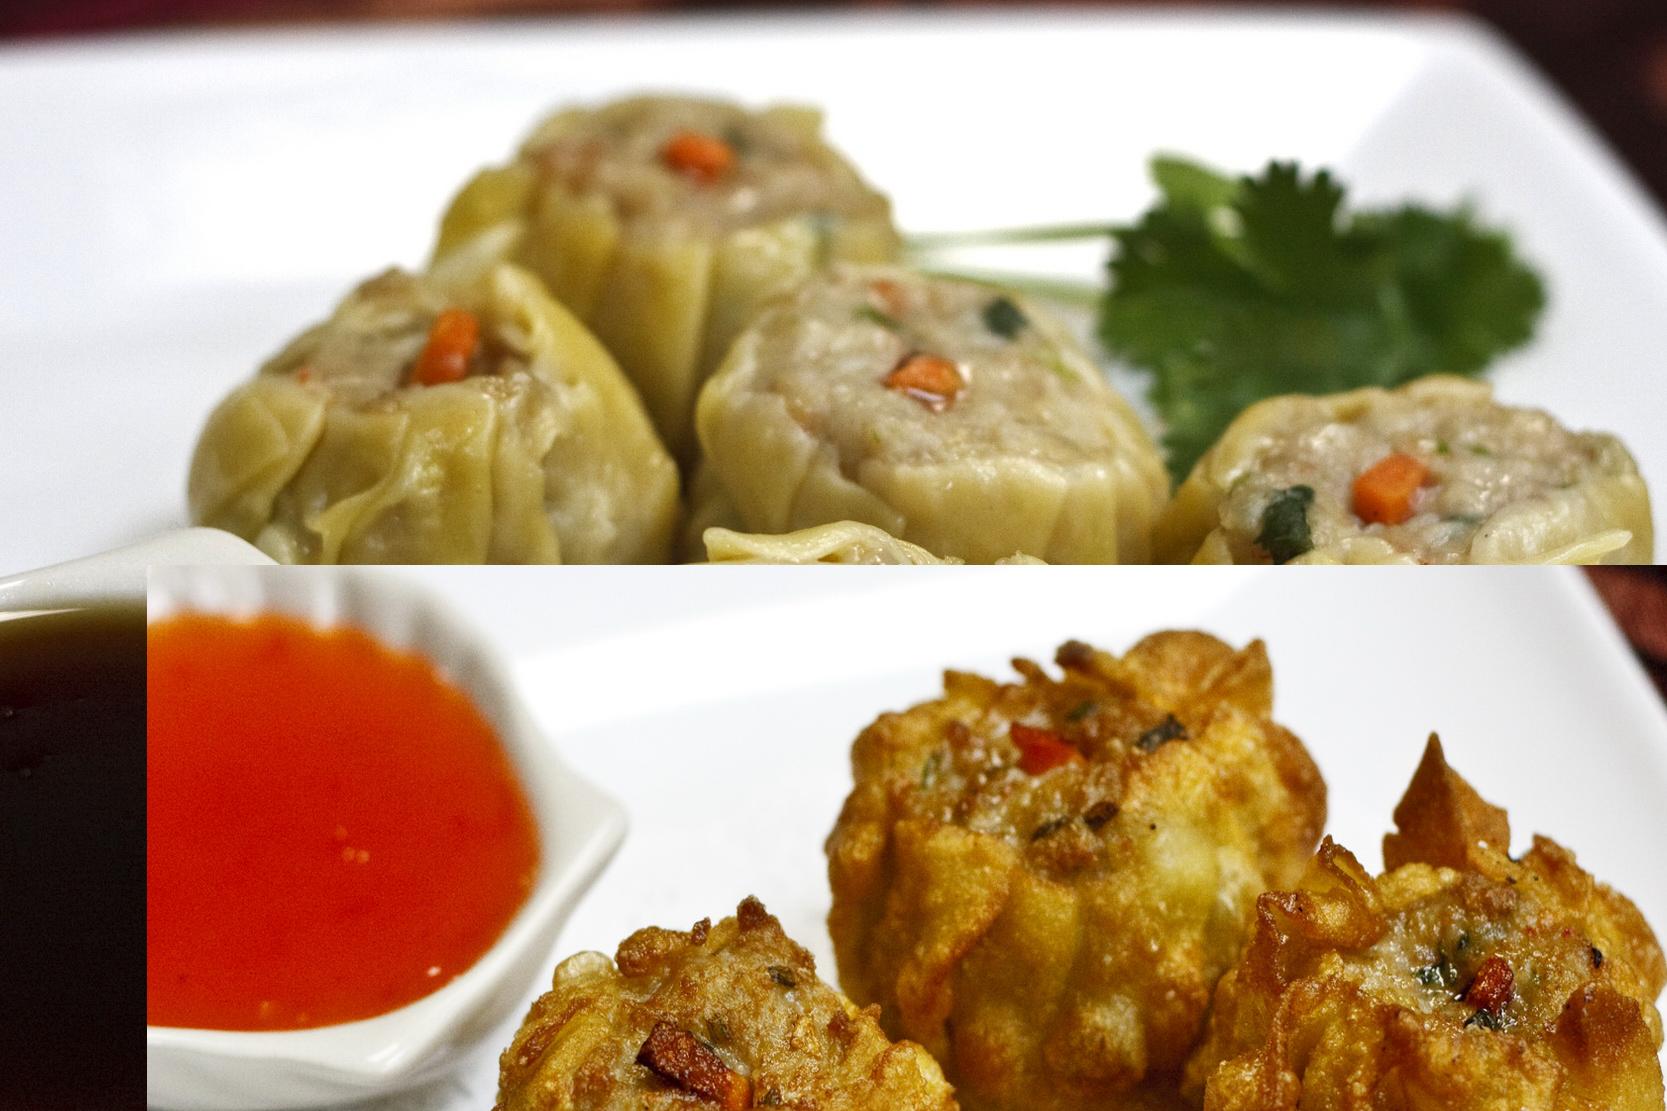 (3) Ka-Nom-Jeeb (Dumplings) Image